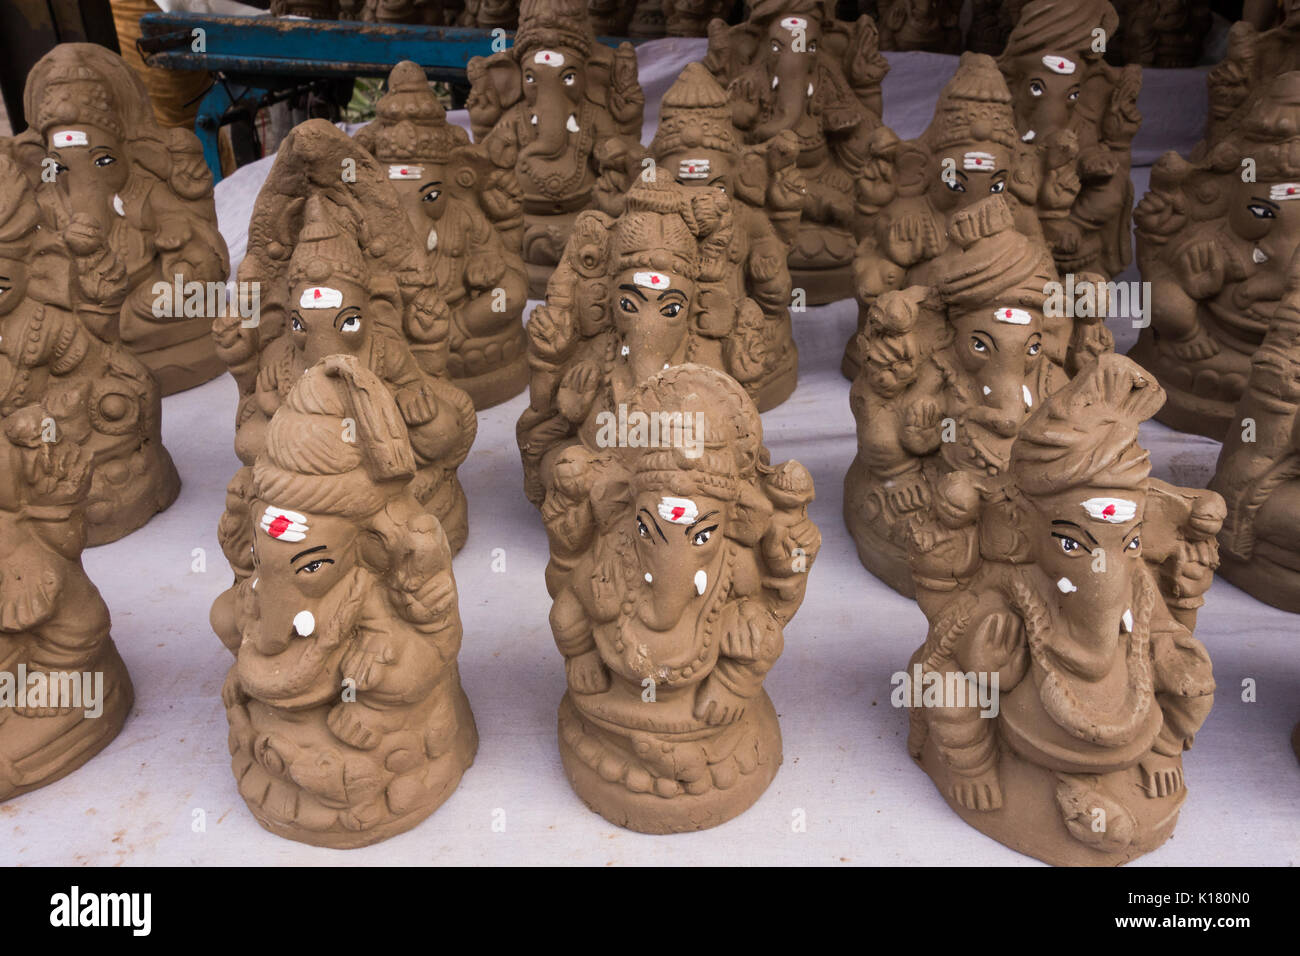 hyderabad, india - august 25,2017 eco-friendly clay idols of ganesha